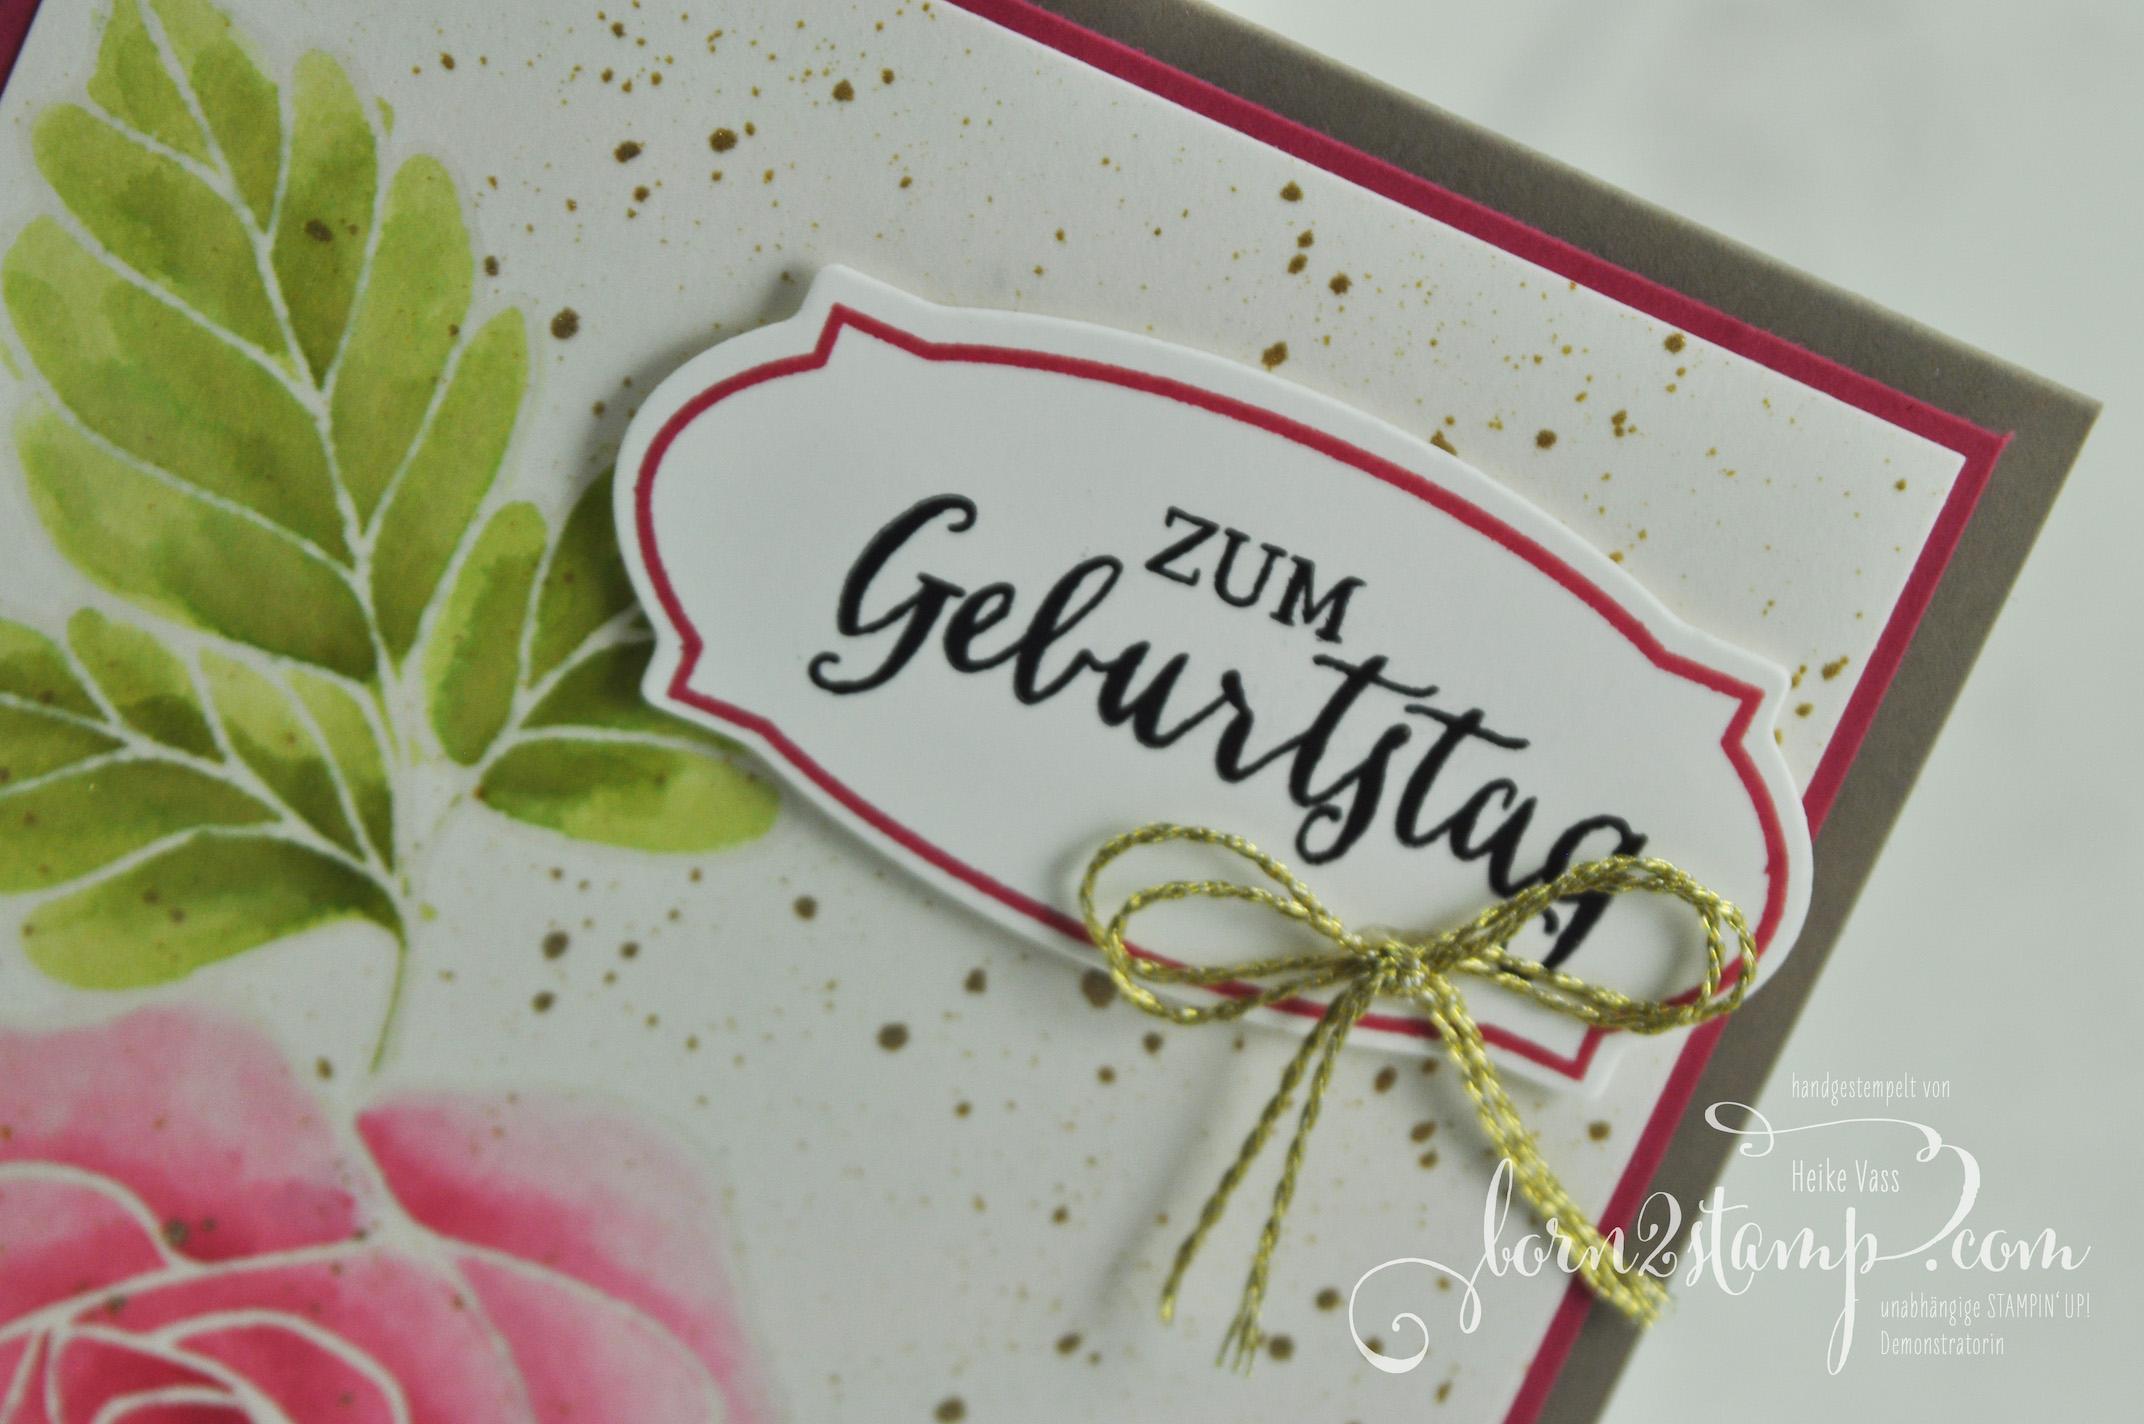 born2stamp STAMPIN' UP! Geburtstagskarte – Aqua Painter – Rosenzauber – Thinlits Rosengarten – Kordel – Wink of Stella